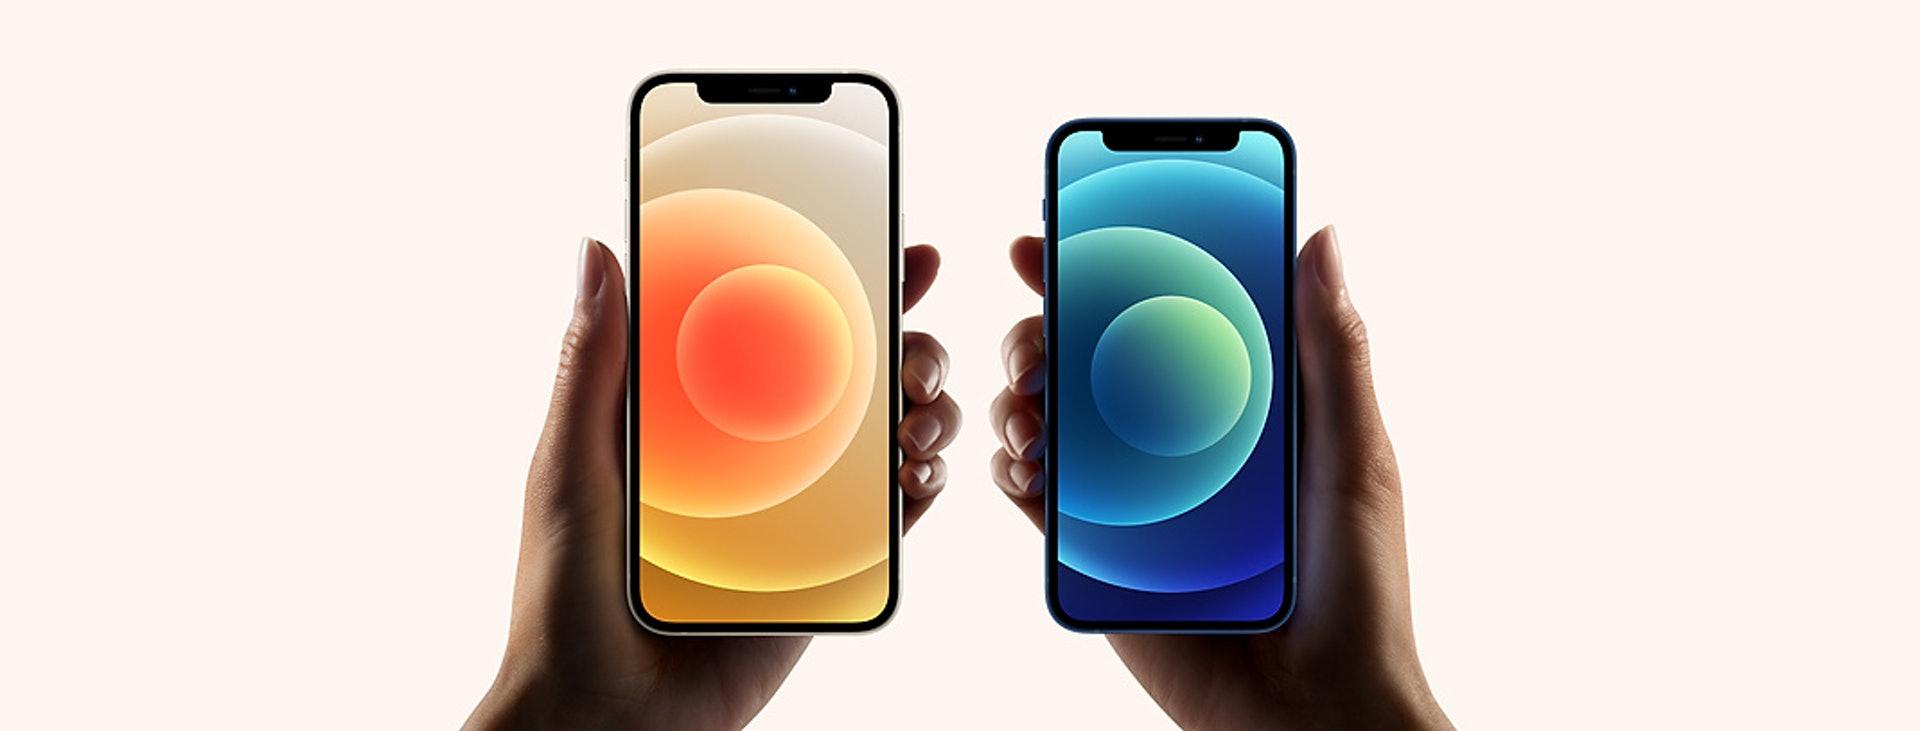 iPhone 12/12 mini(Apple官網)